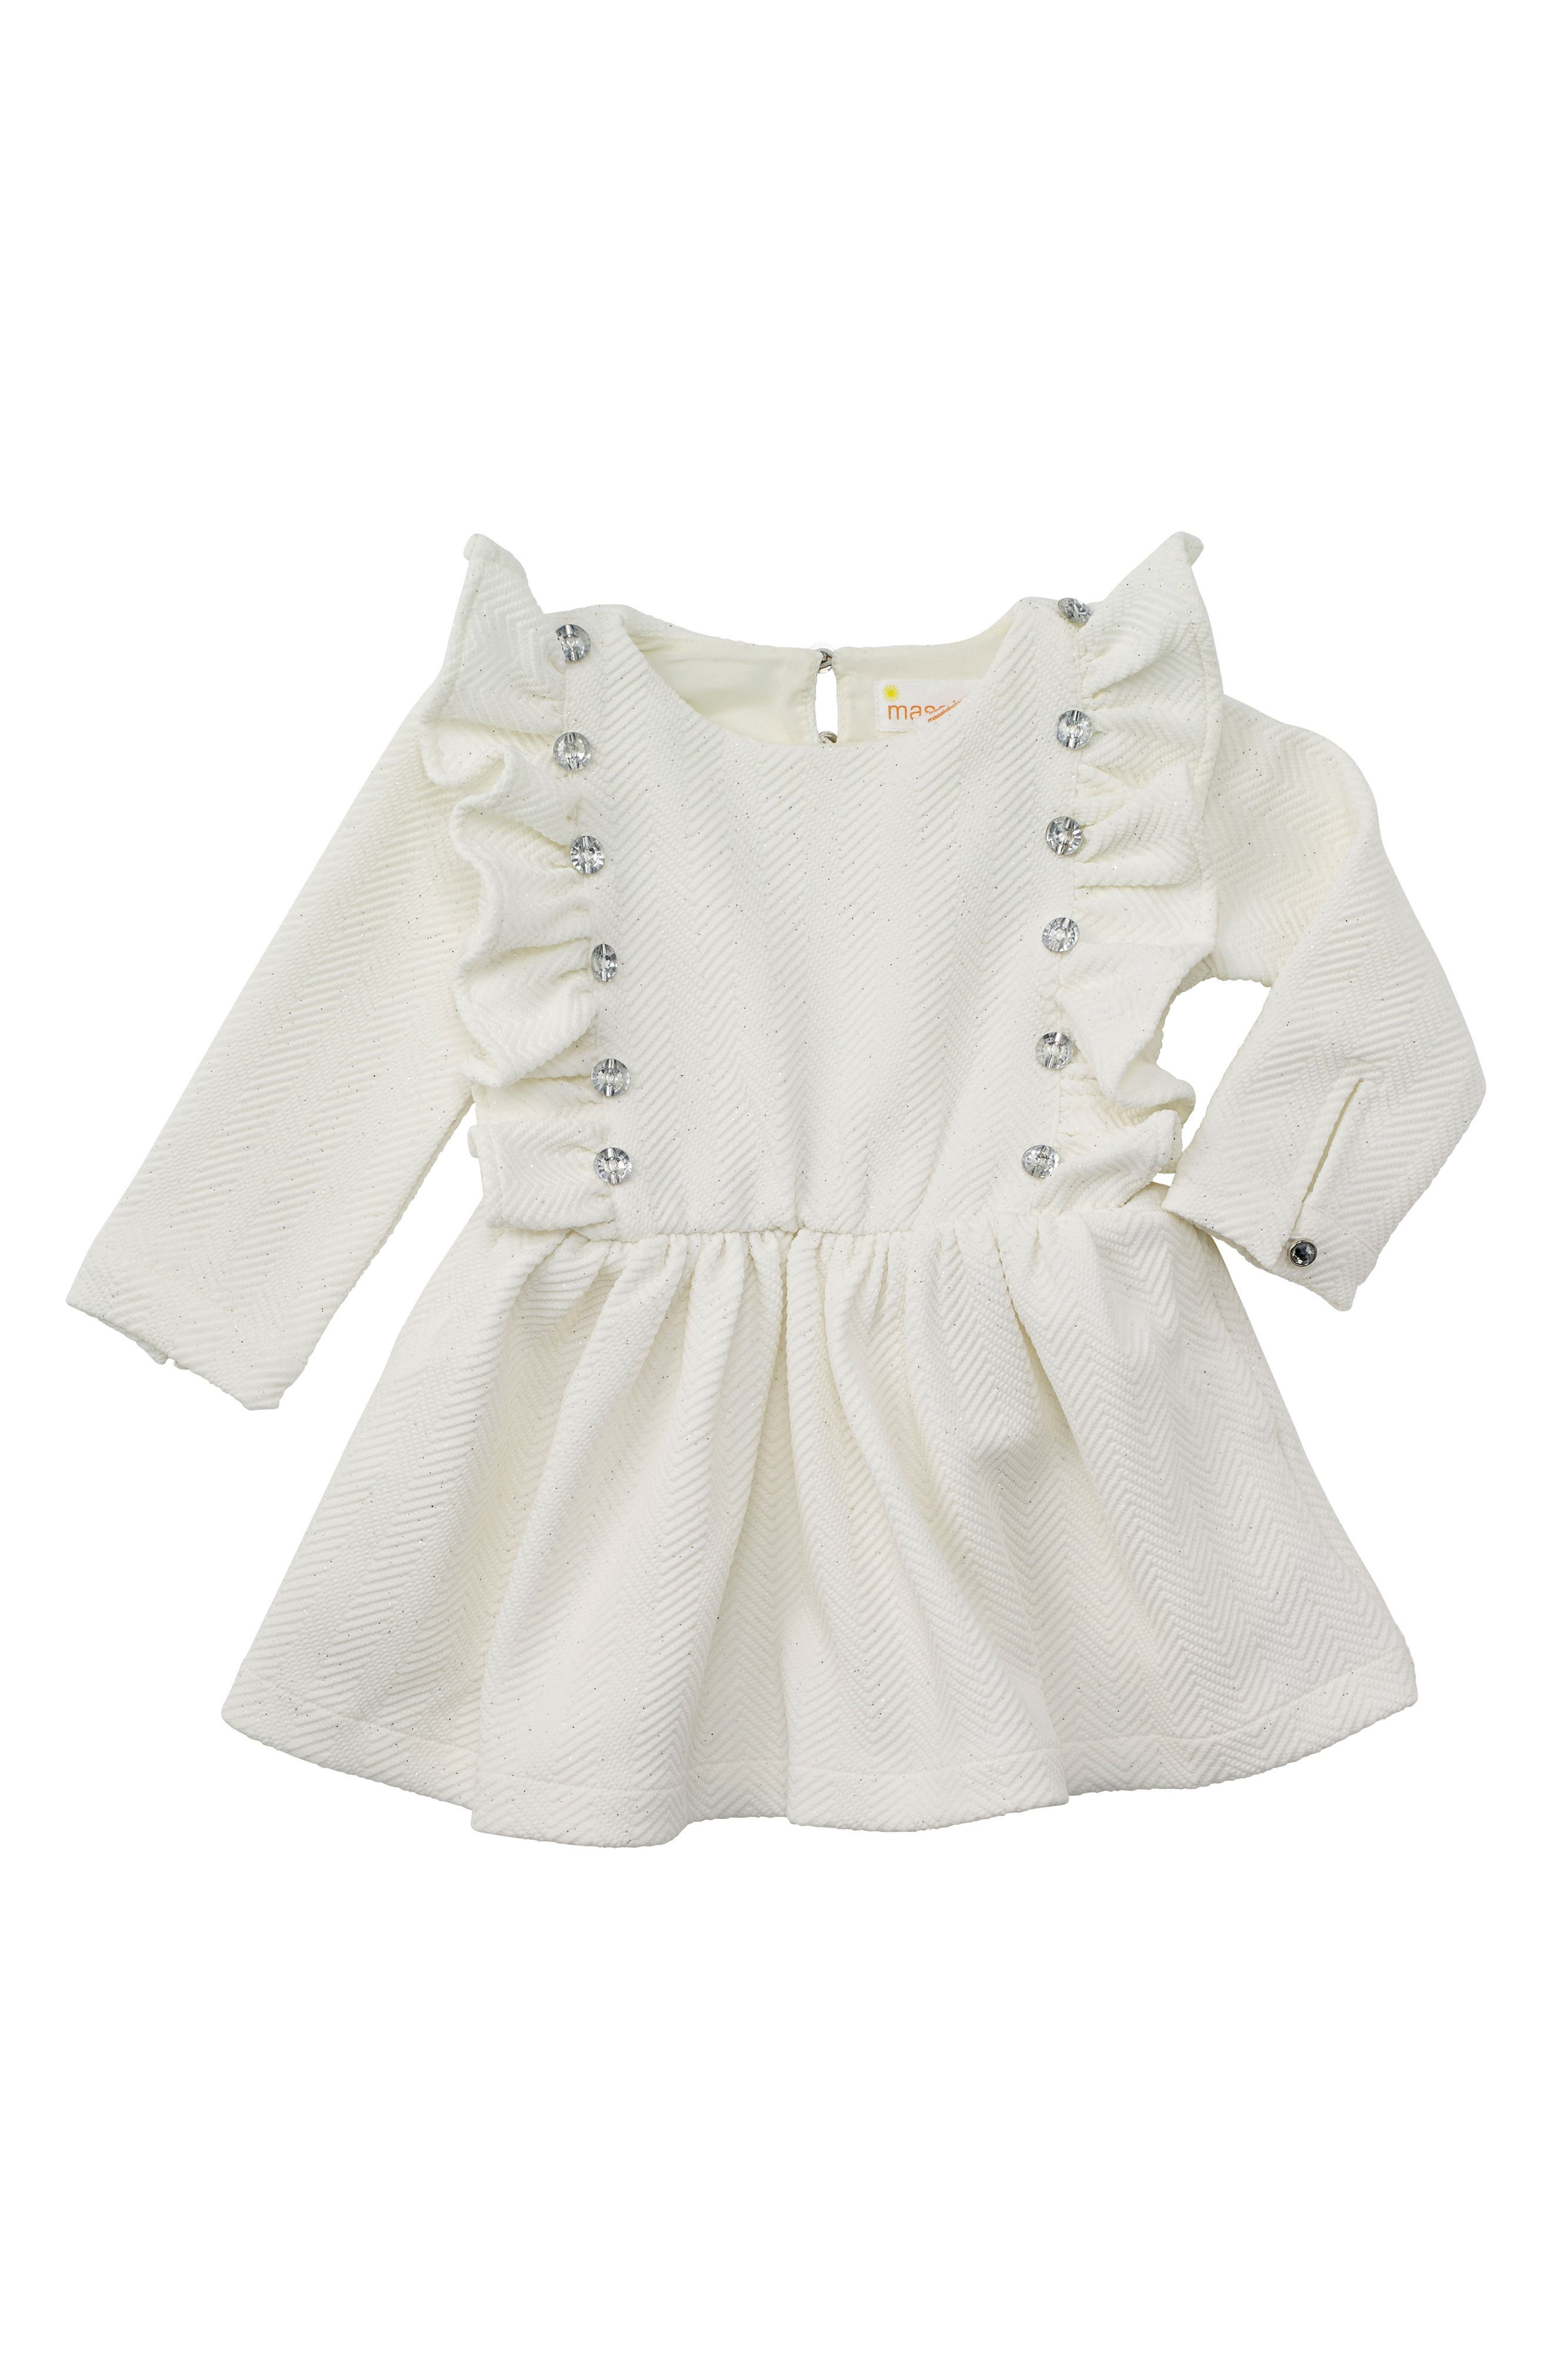 Alternate Image 1 Selected - Masalababy Fantasia Dress (Baby Girls)